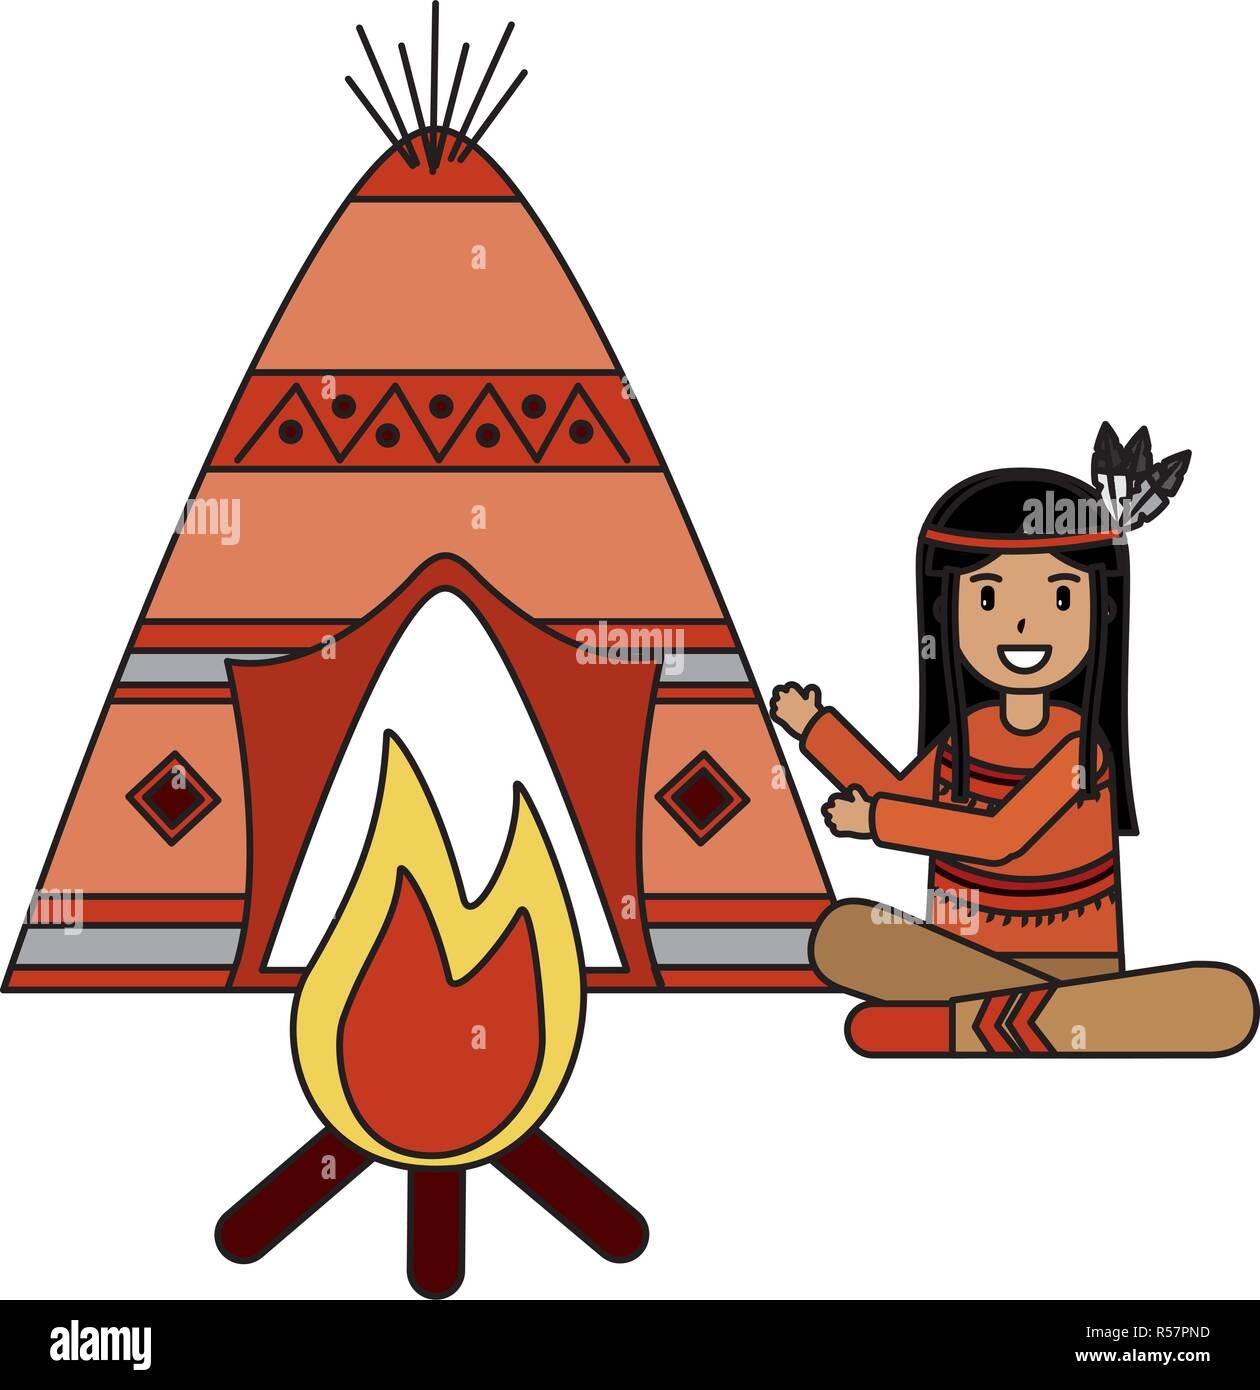 native american character - Stock Image